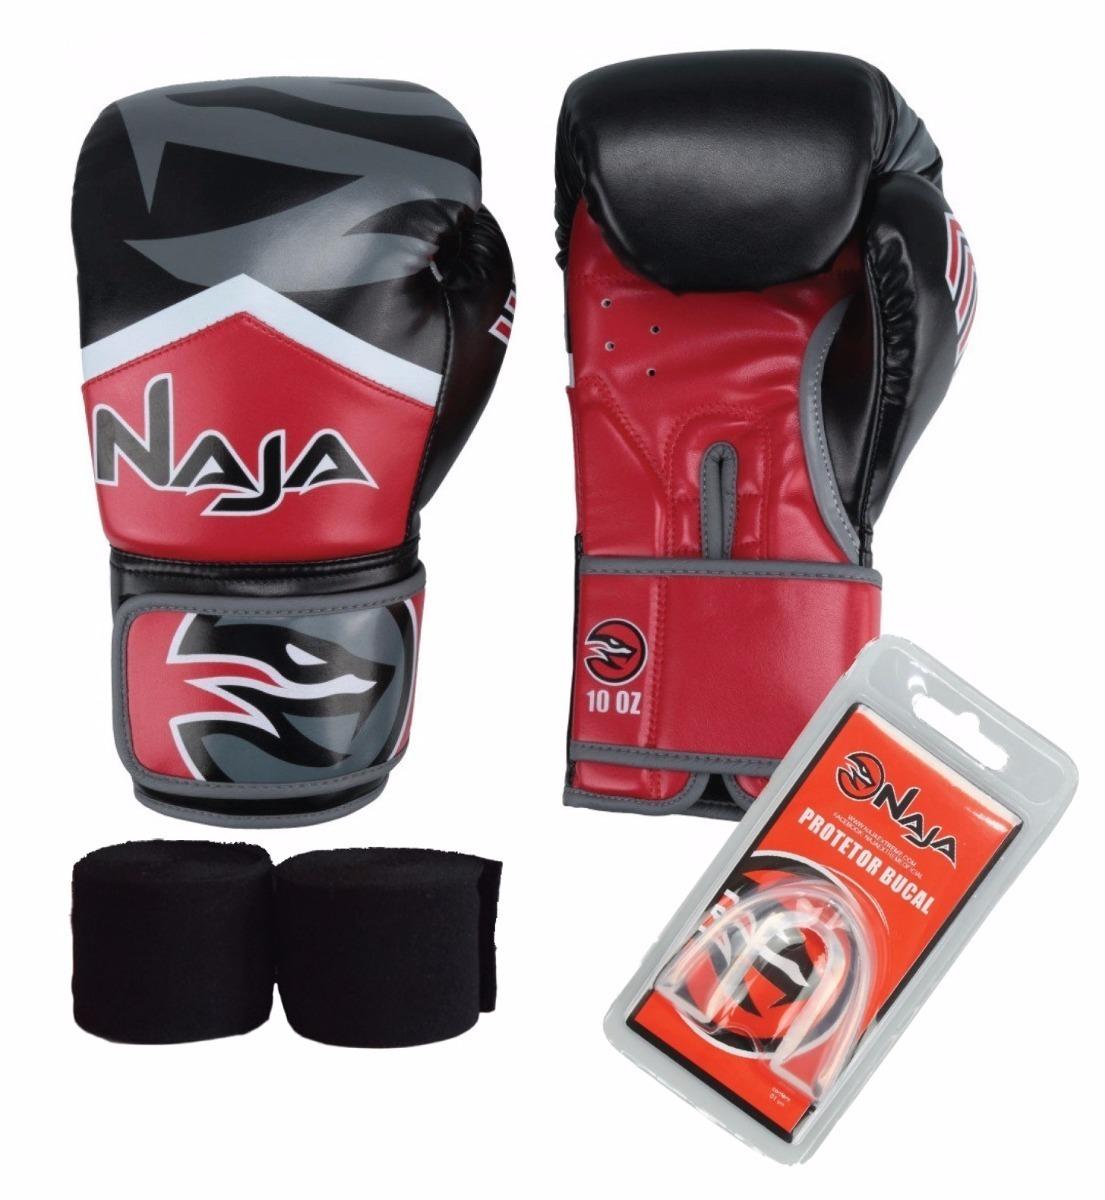 3b2439efd kit luva muay thai   boxe naja new extreme+band+p.bucal. Carregando zoom.